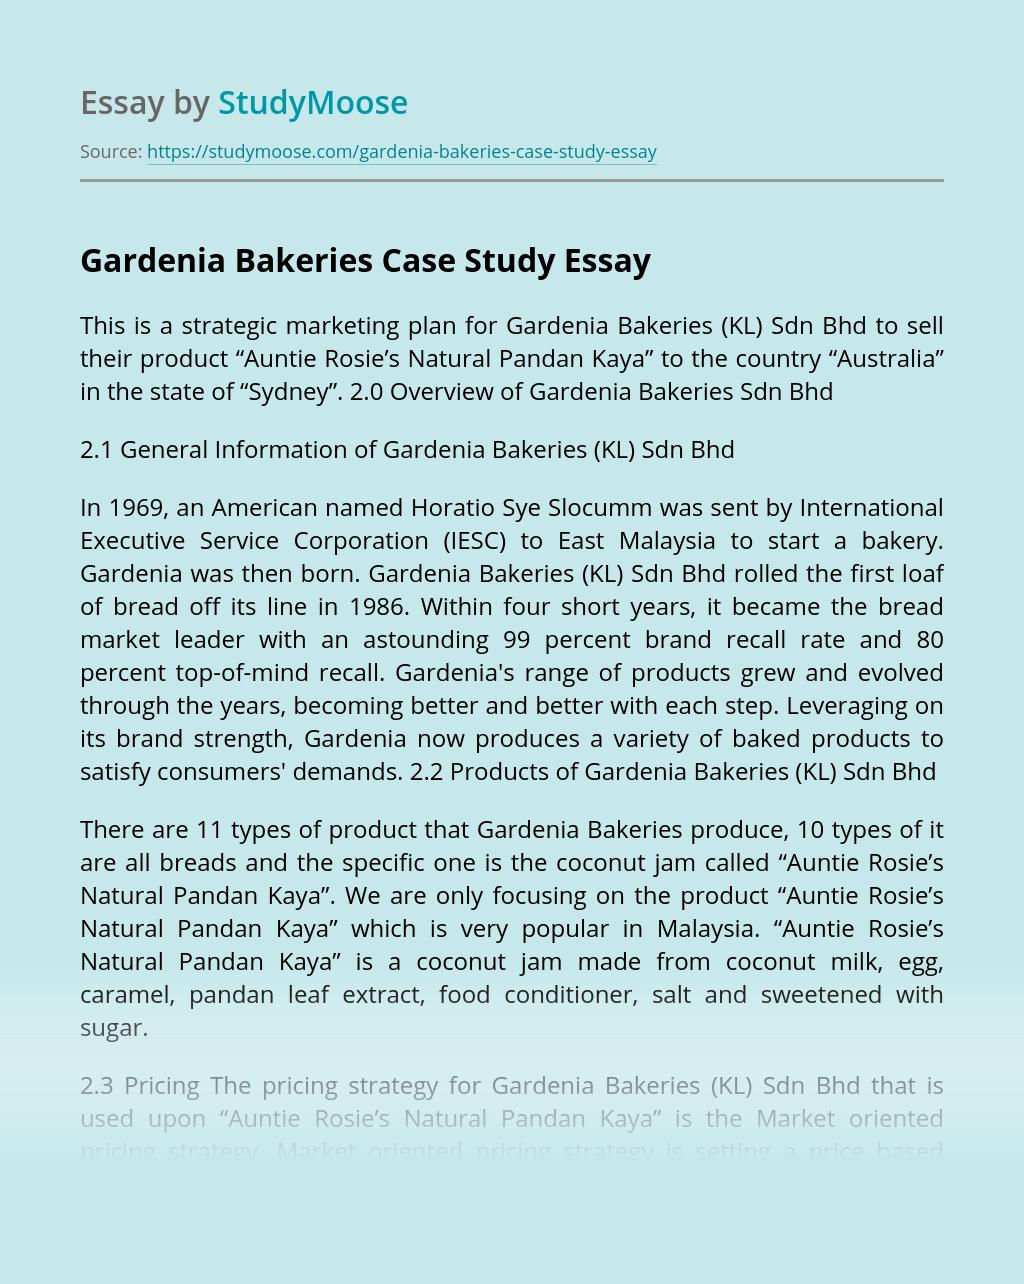 Gardenia Bakeries Case Study